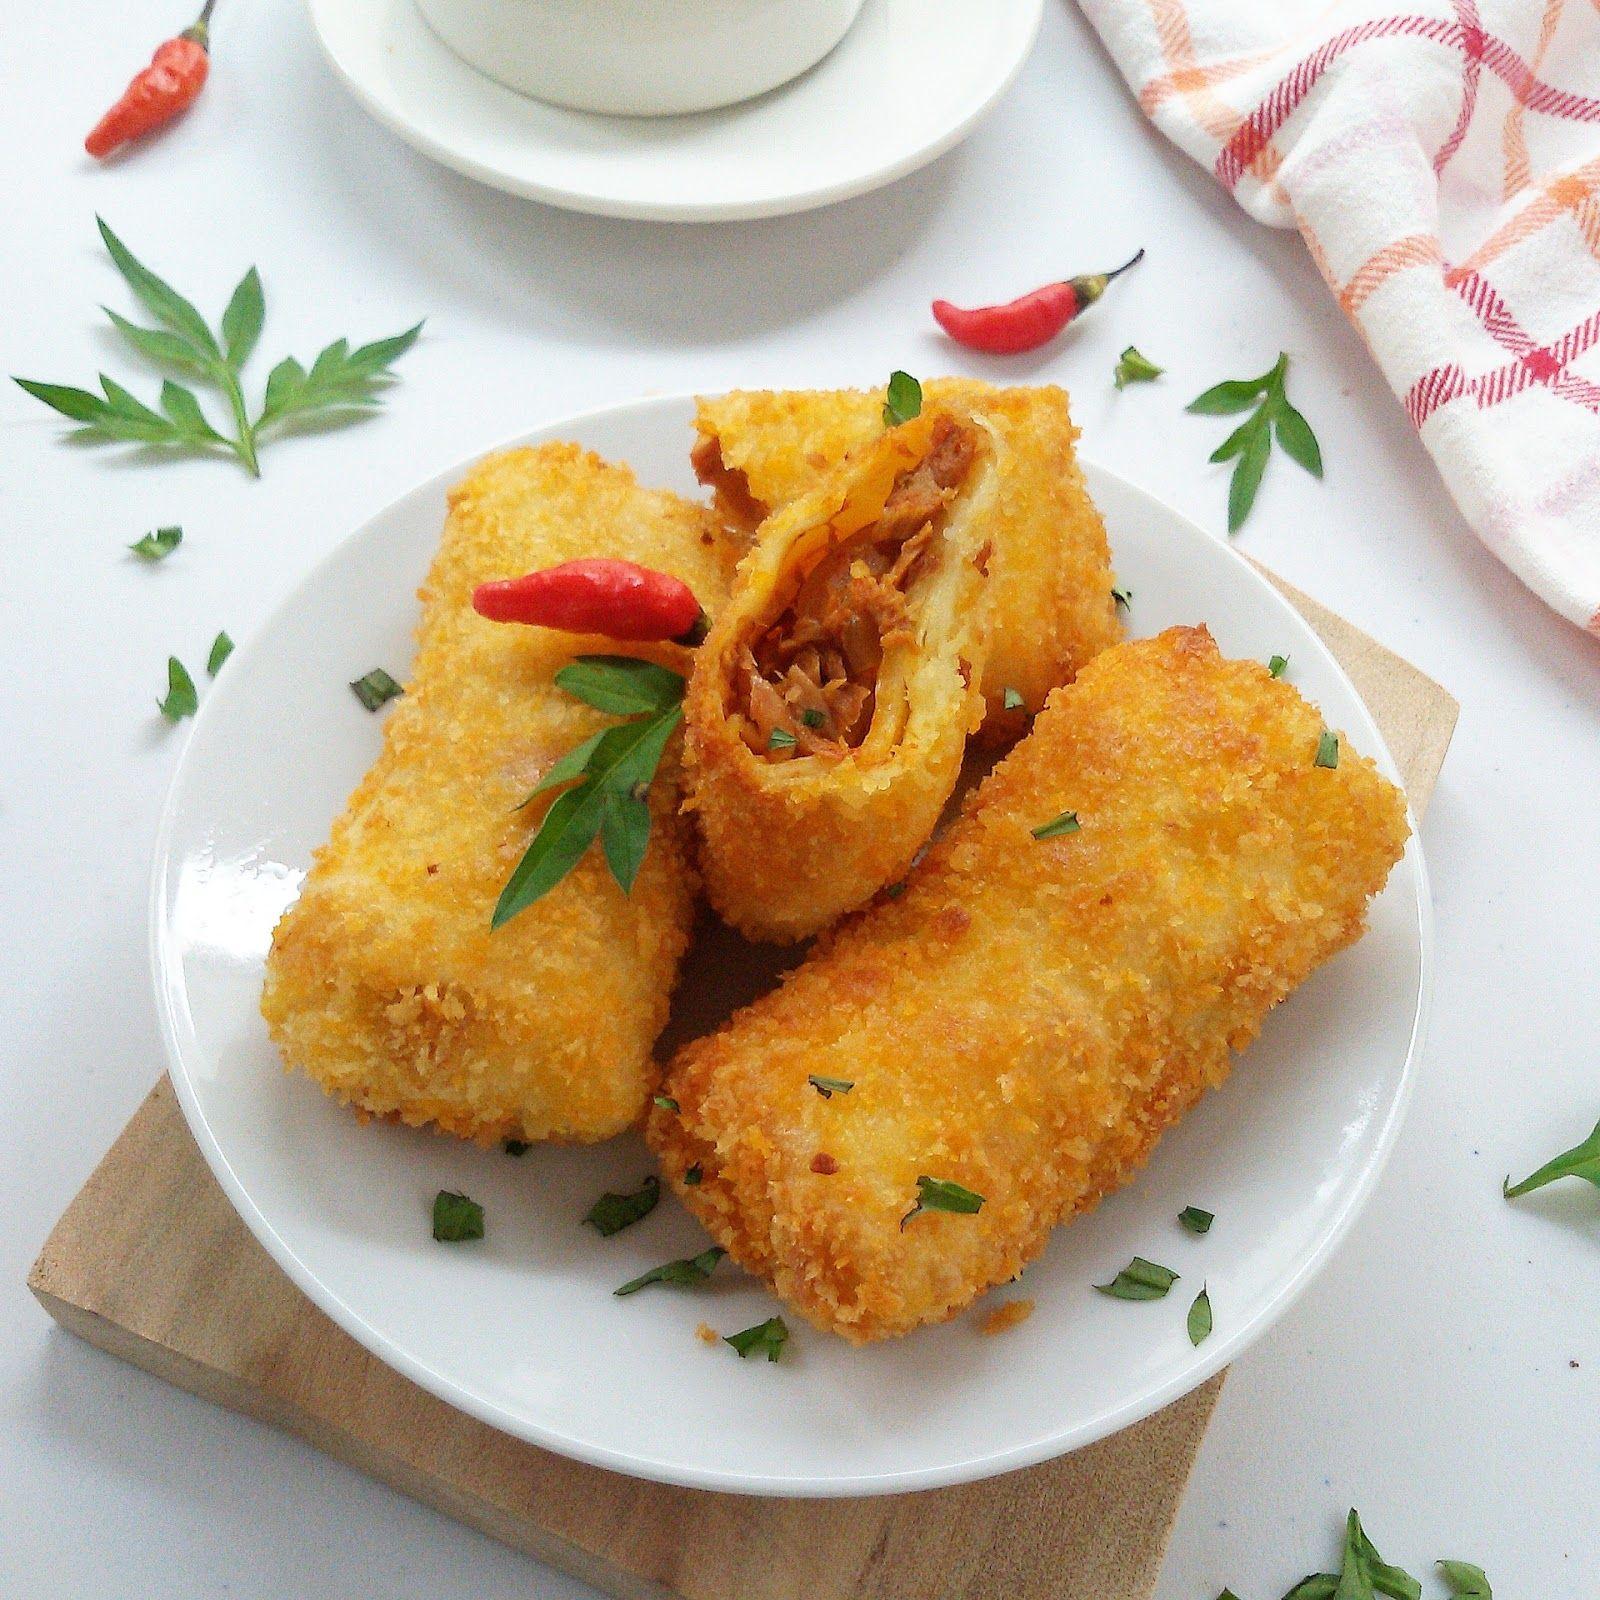 Resep Risoles Mayonaise Makanan Dan Minuman Makanan